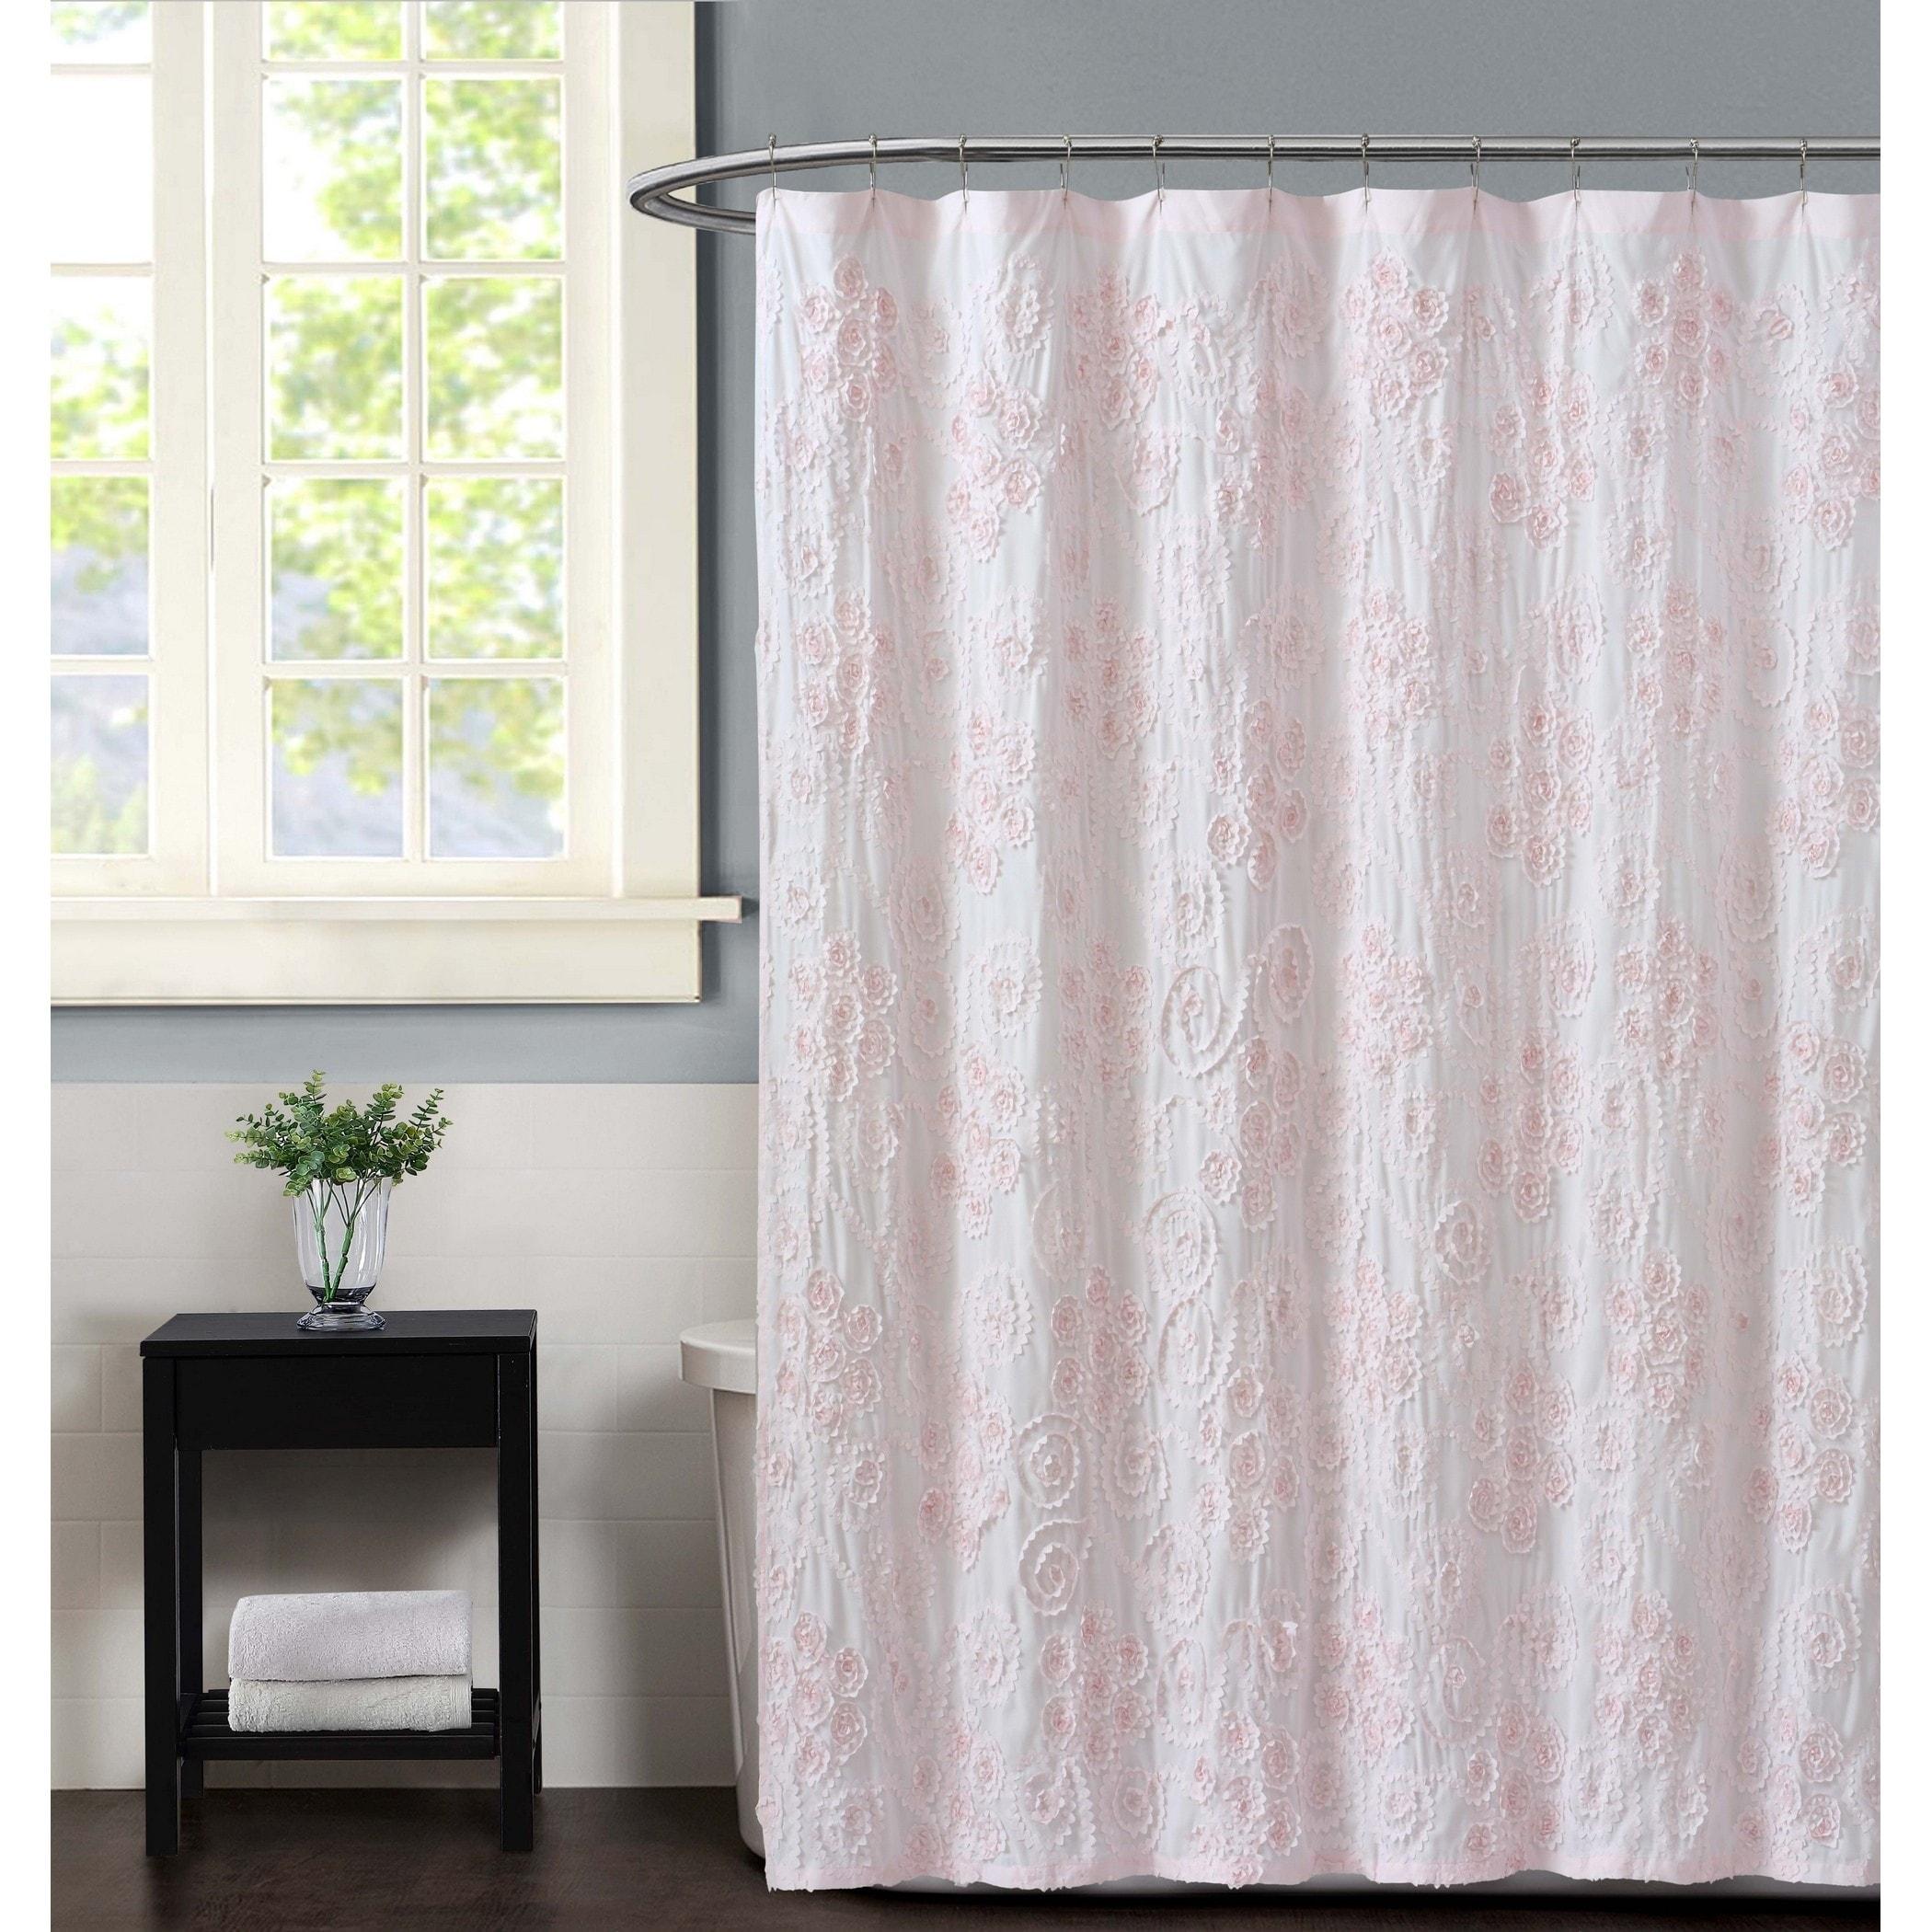 Shop Christian Siriano Pretty Petals 72 X 72 Shower Curtain On